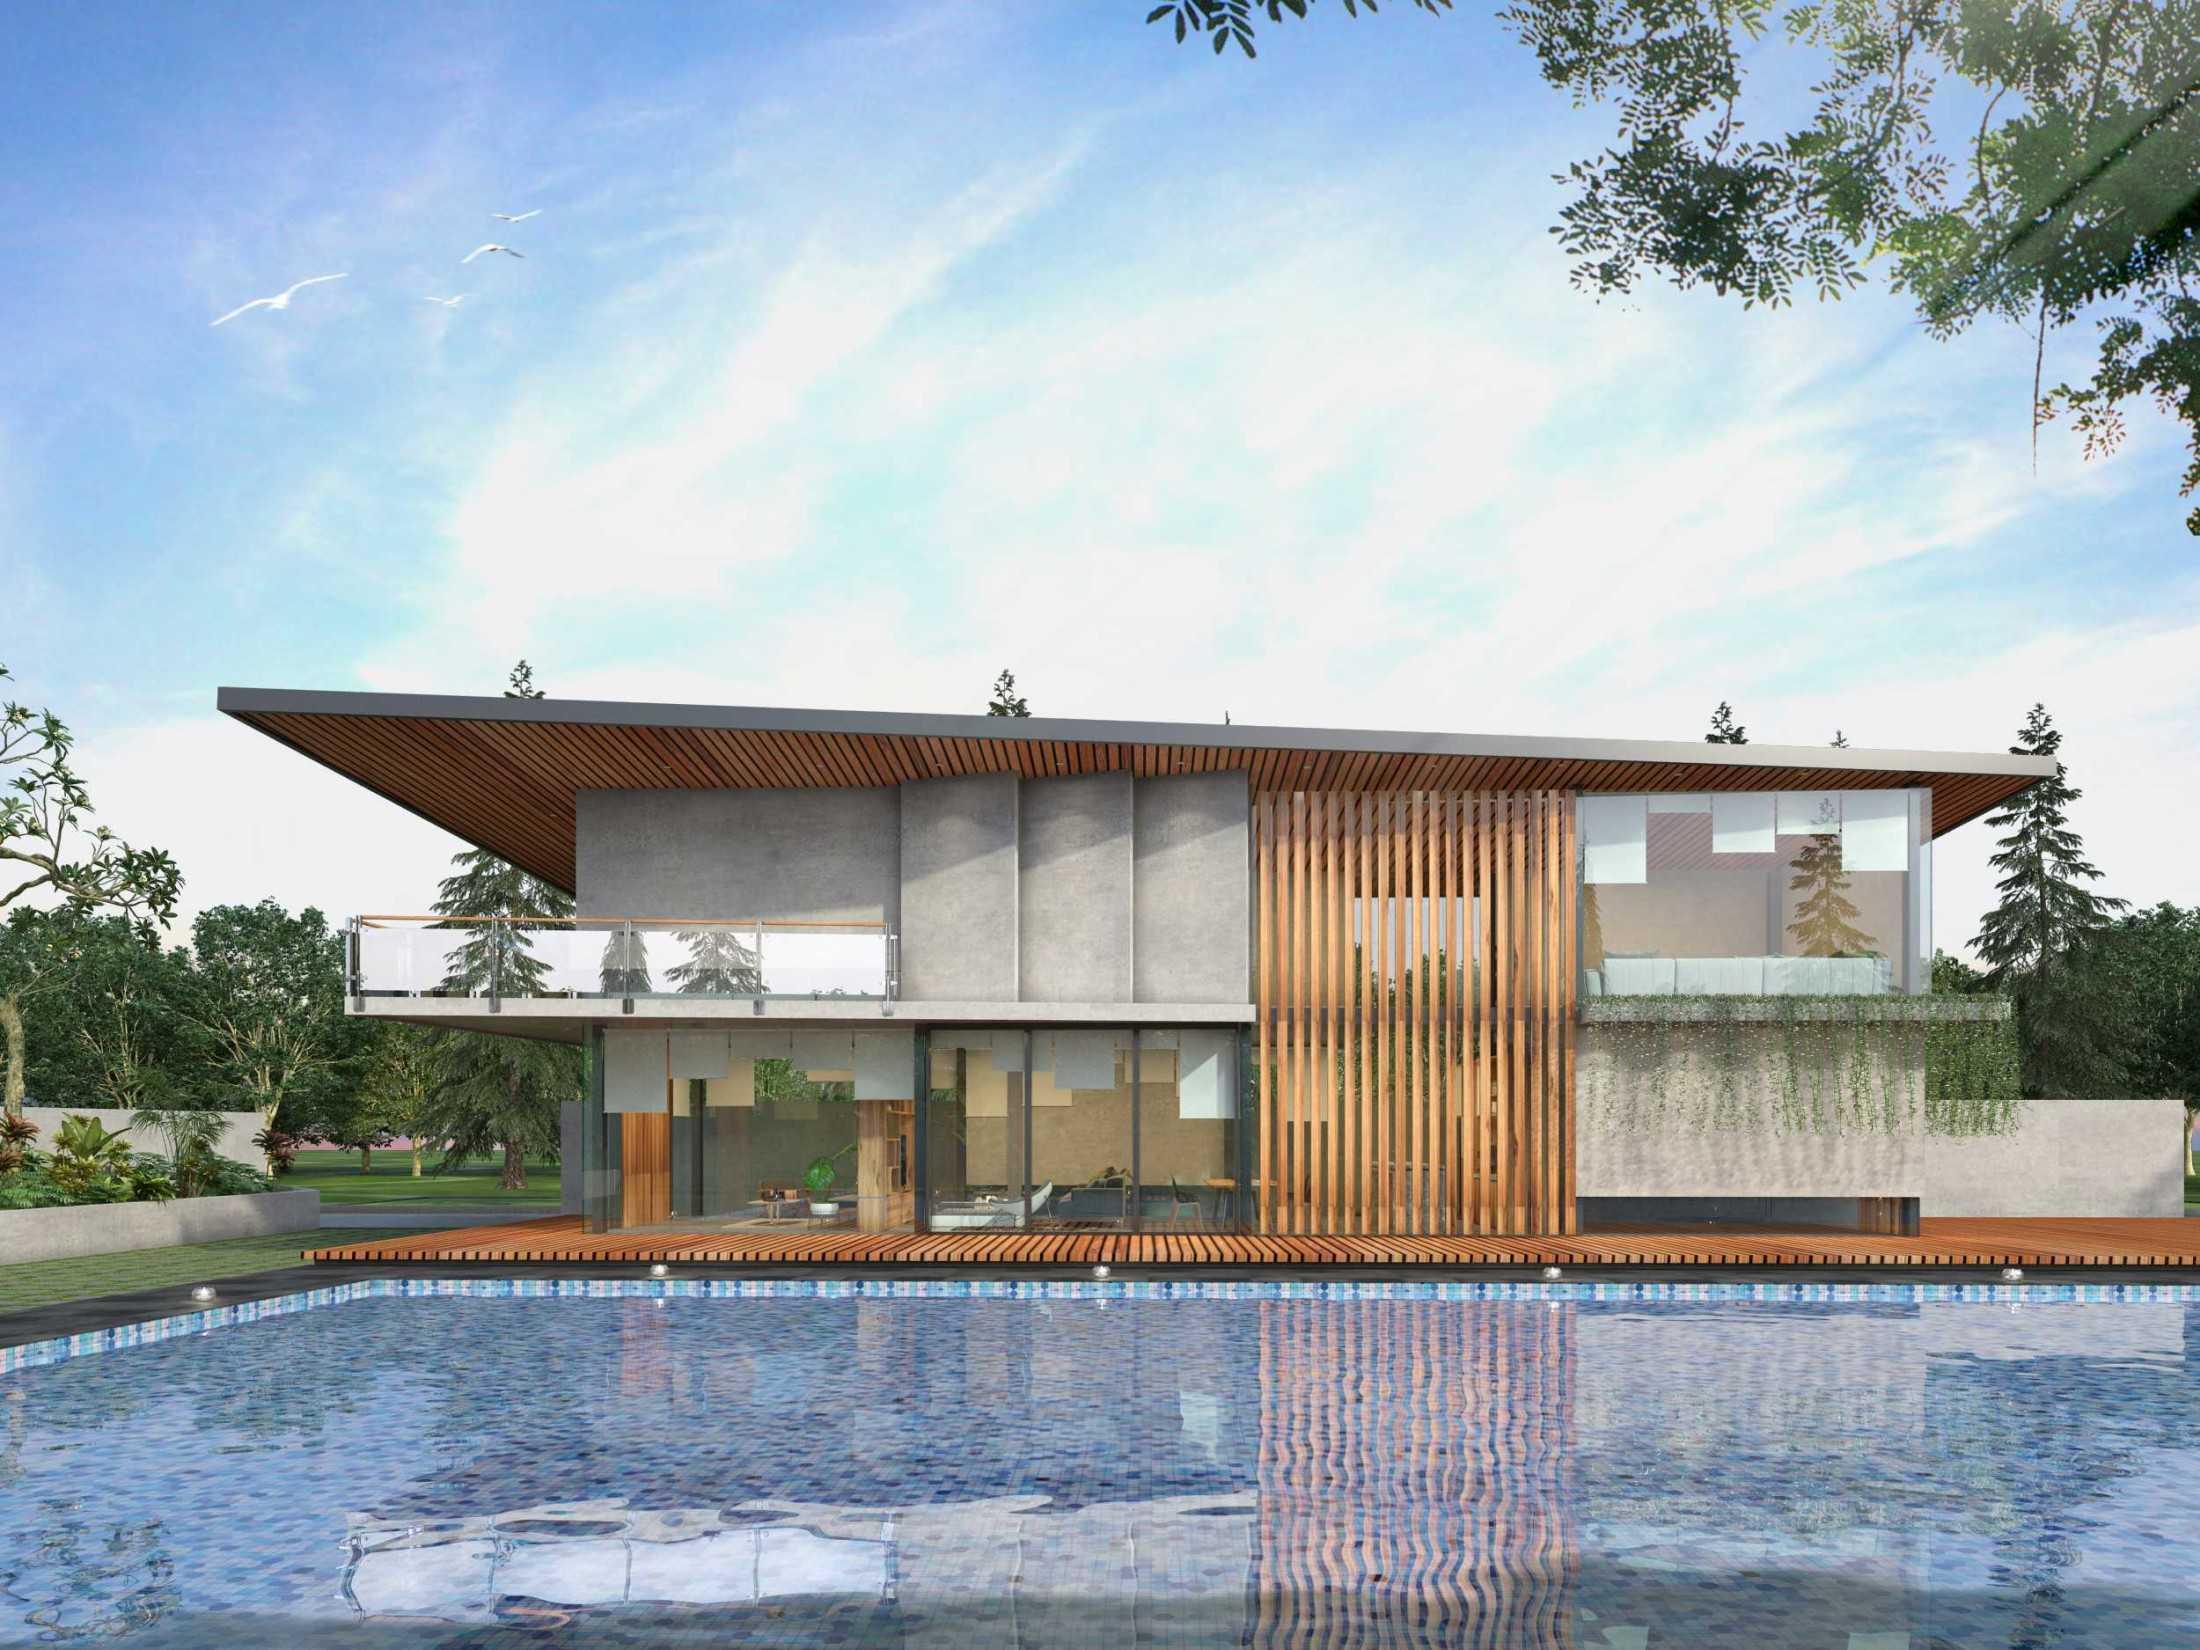 MULA Design Studio di Biak Numfor